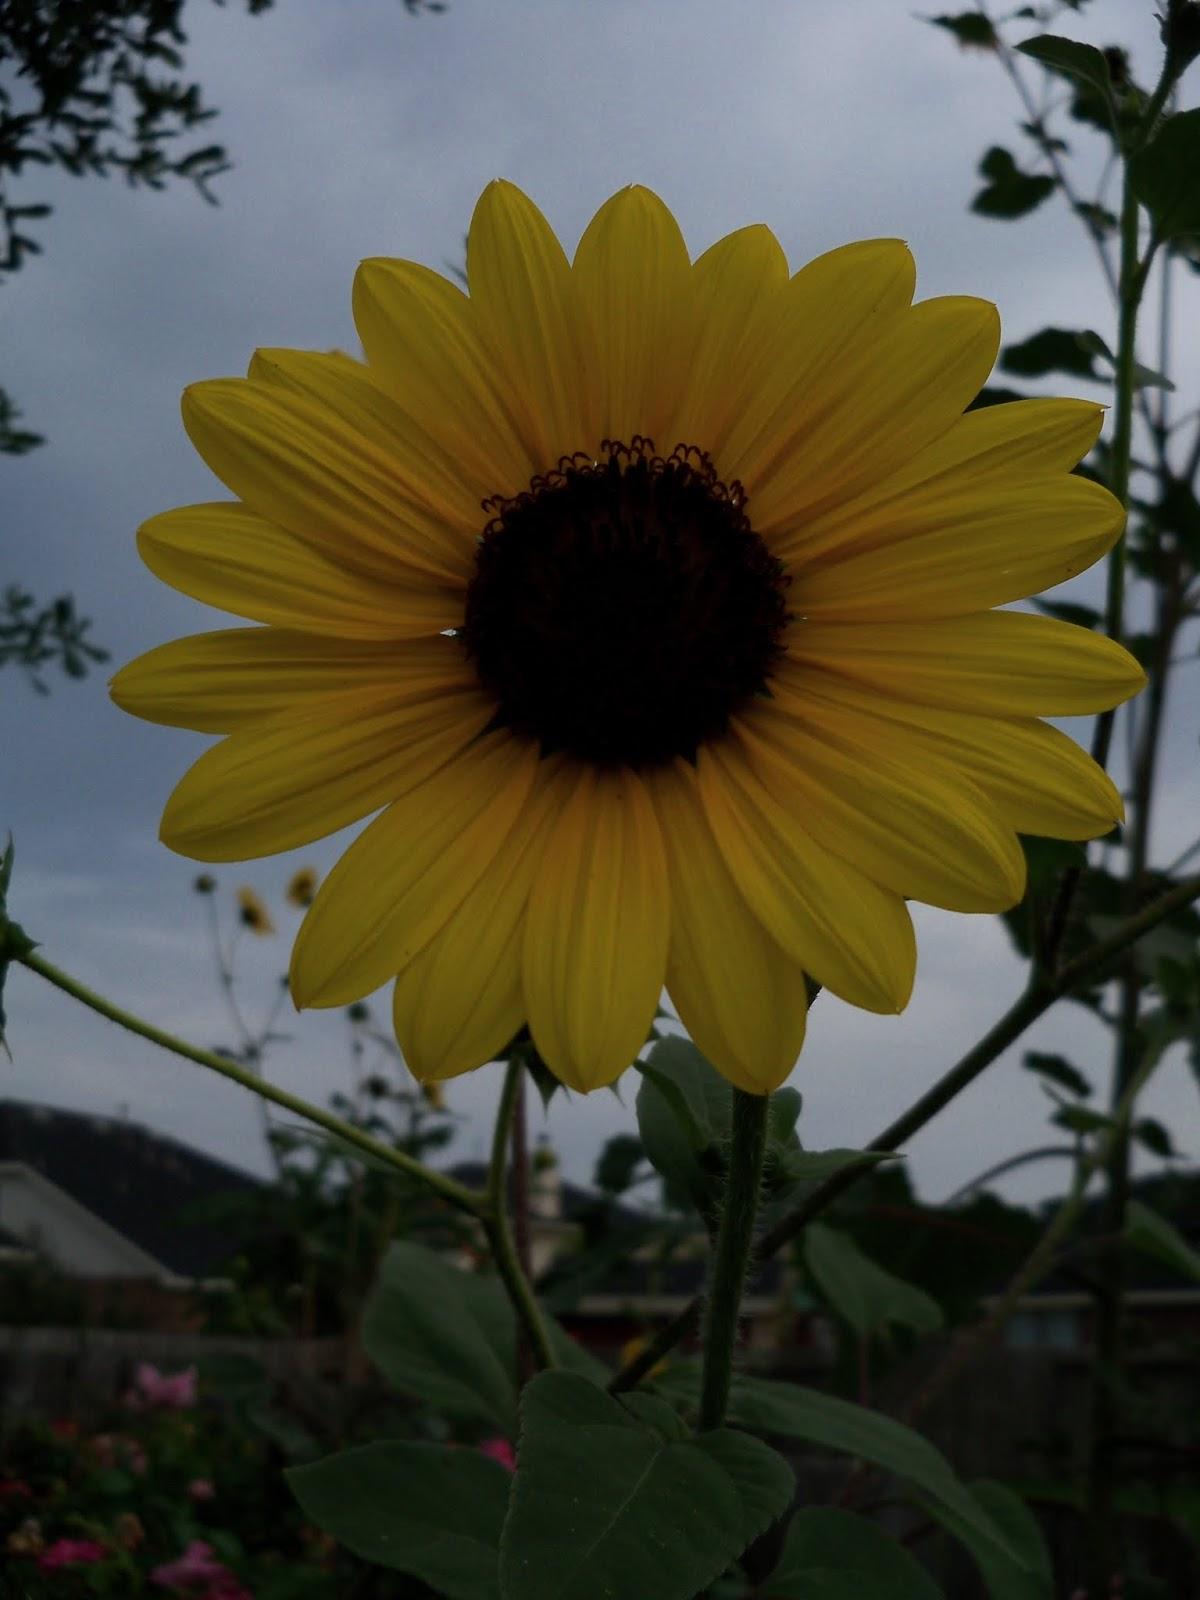 Gardening 2013 - 115_7246.JPG